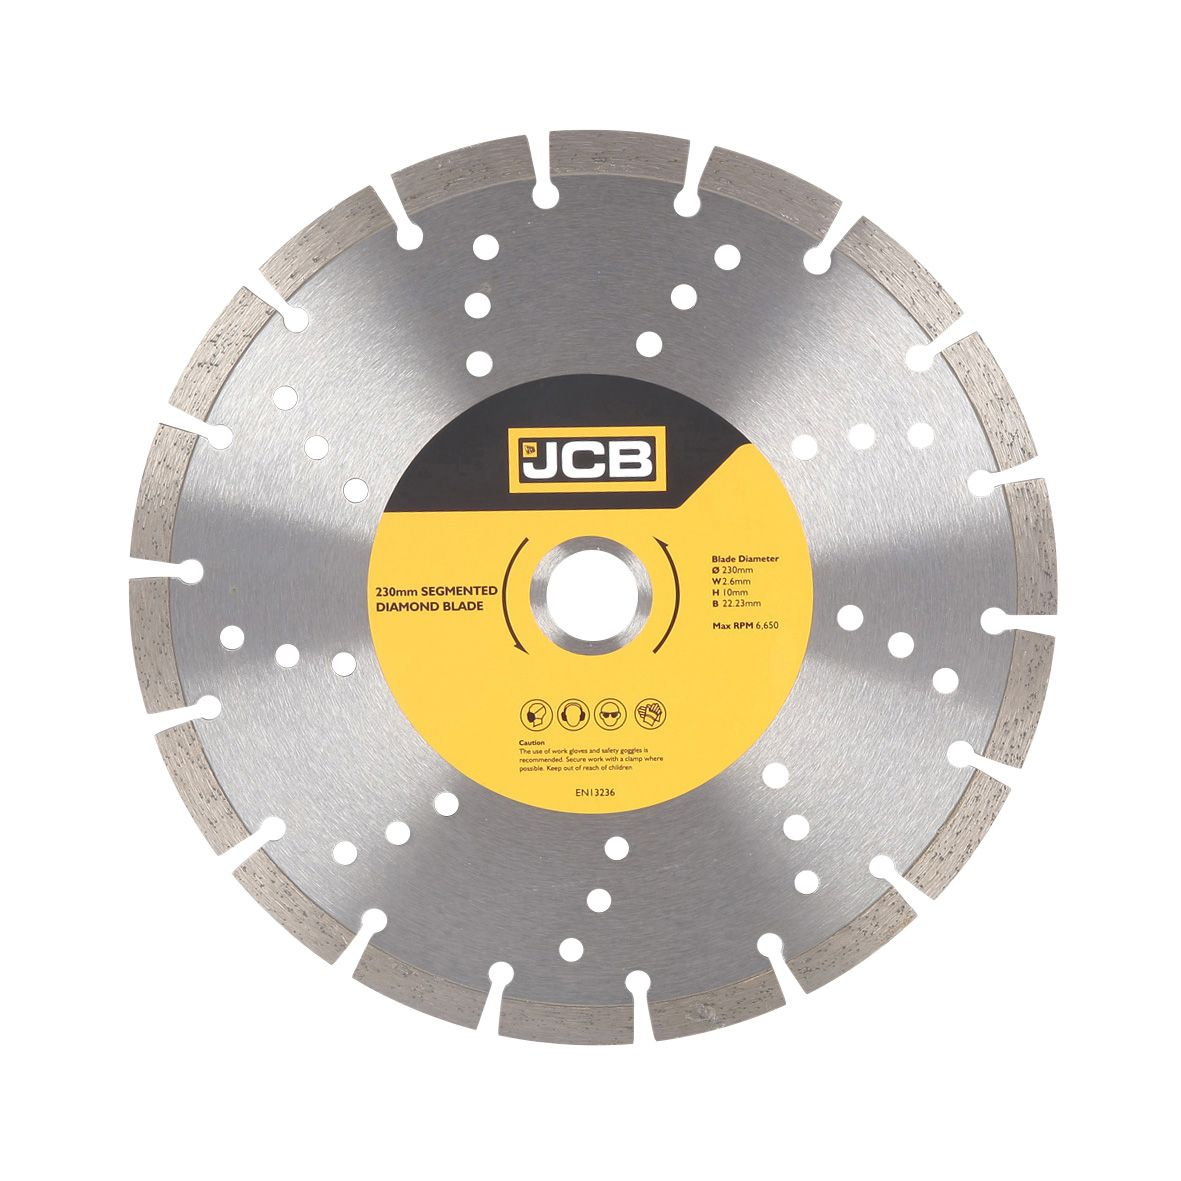 Jcb Dia 230mm Segmented Rim Diamond Blade Departments